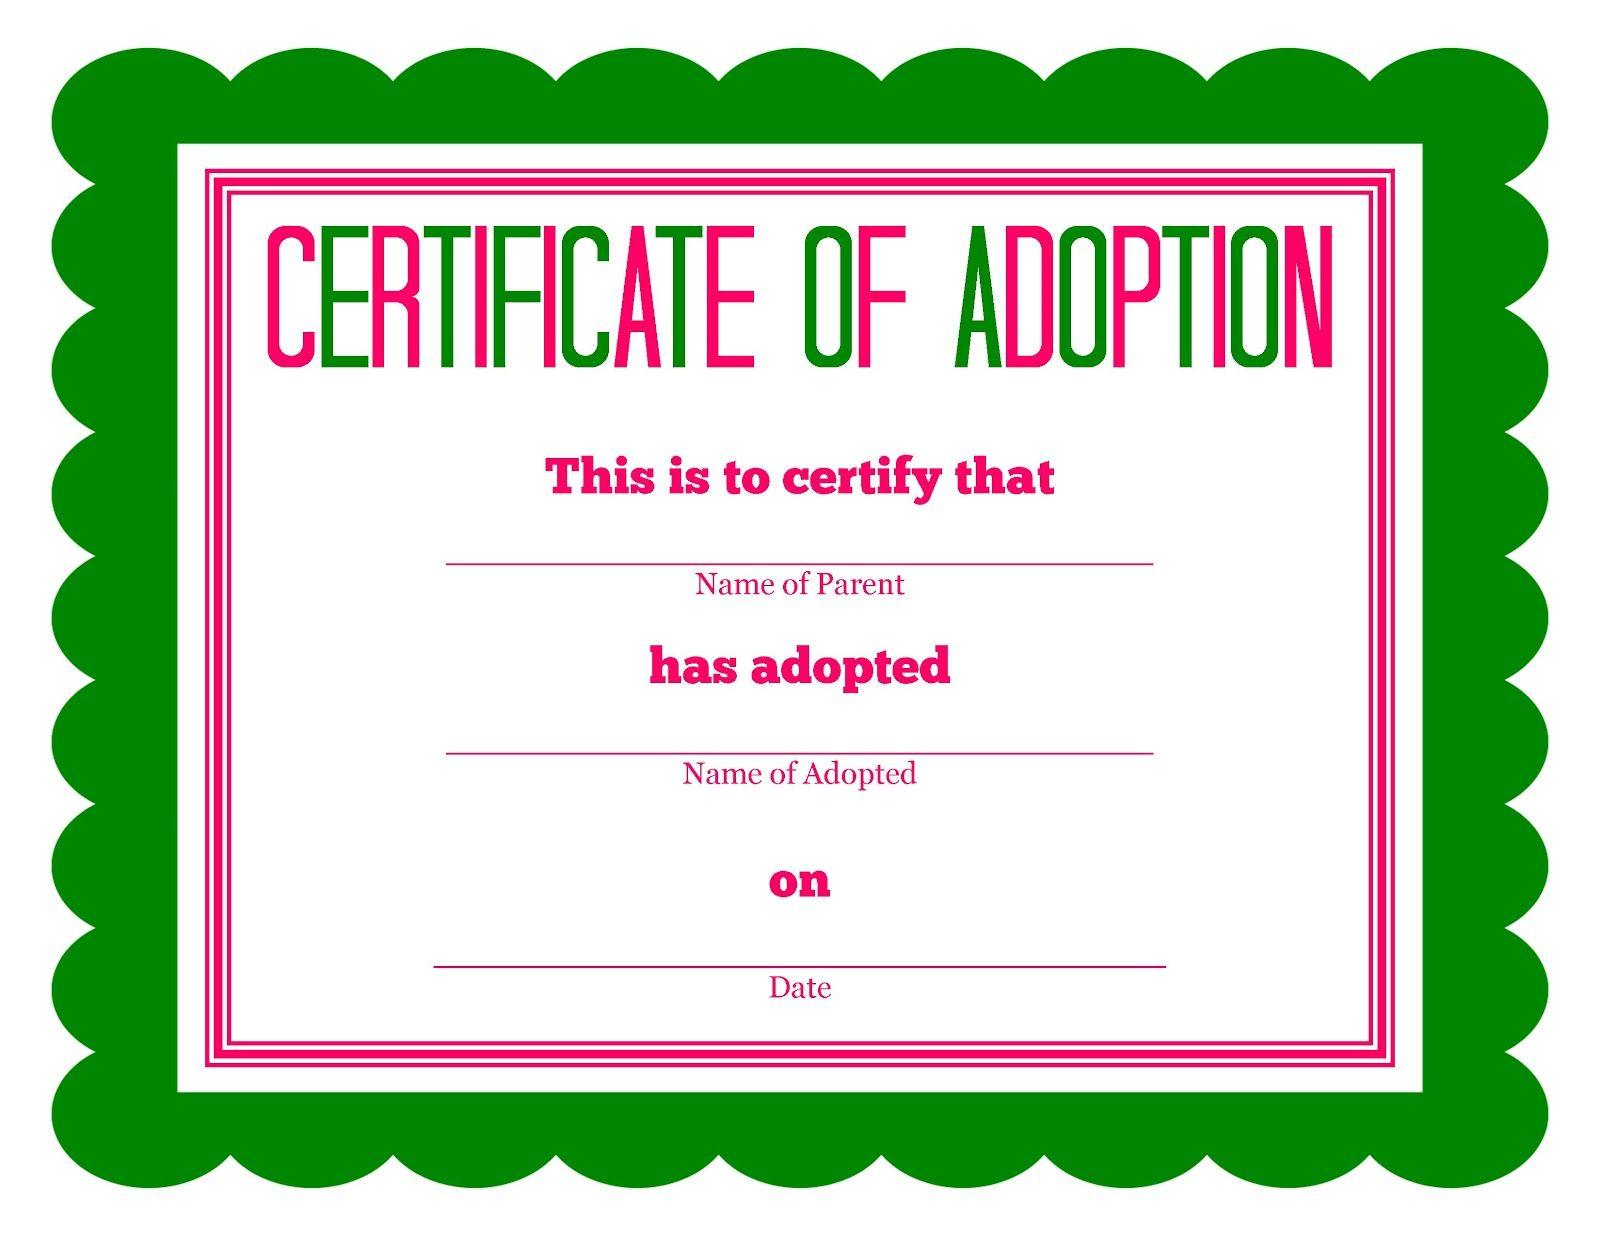 Free Printable Stuffed Animal Adoption Certificate   Free Printables - Free Printable Stuffed Animal Adoption Certificate